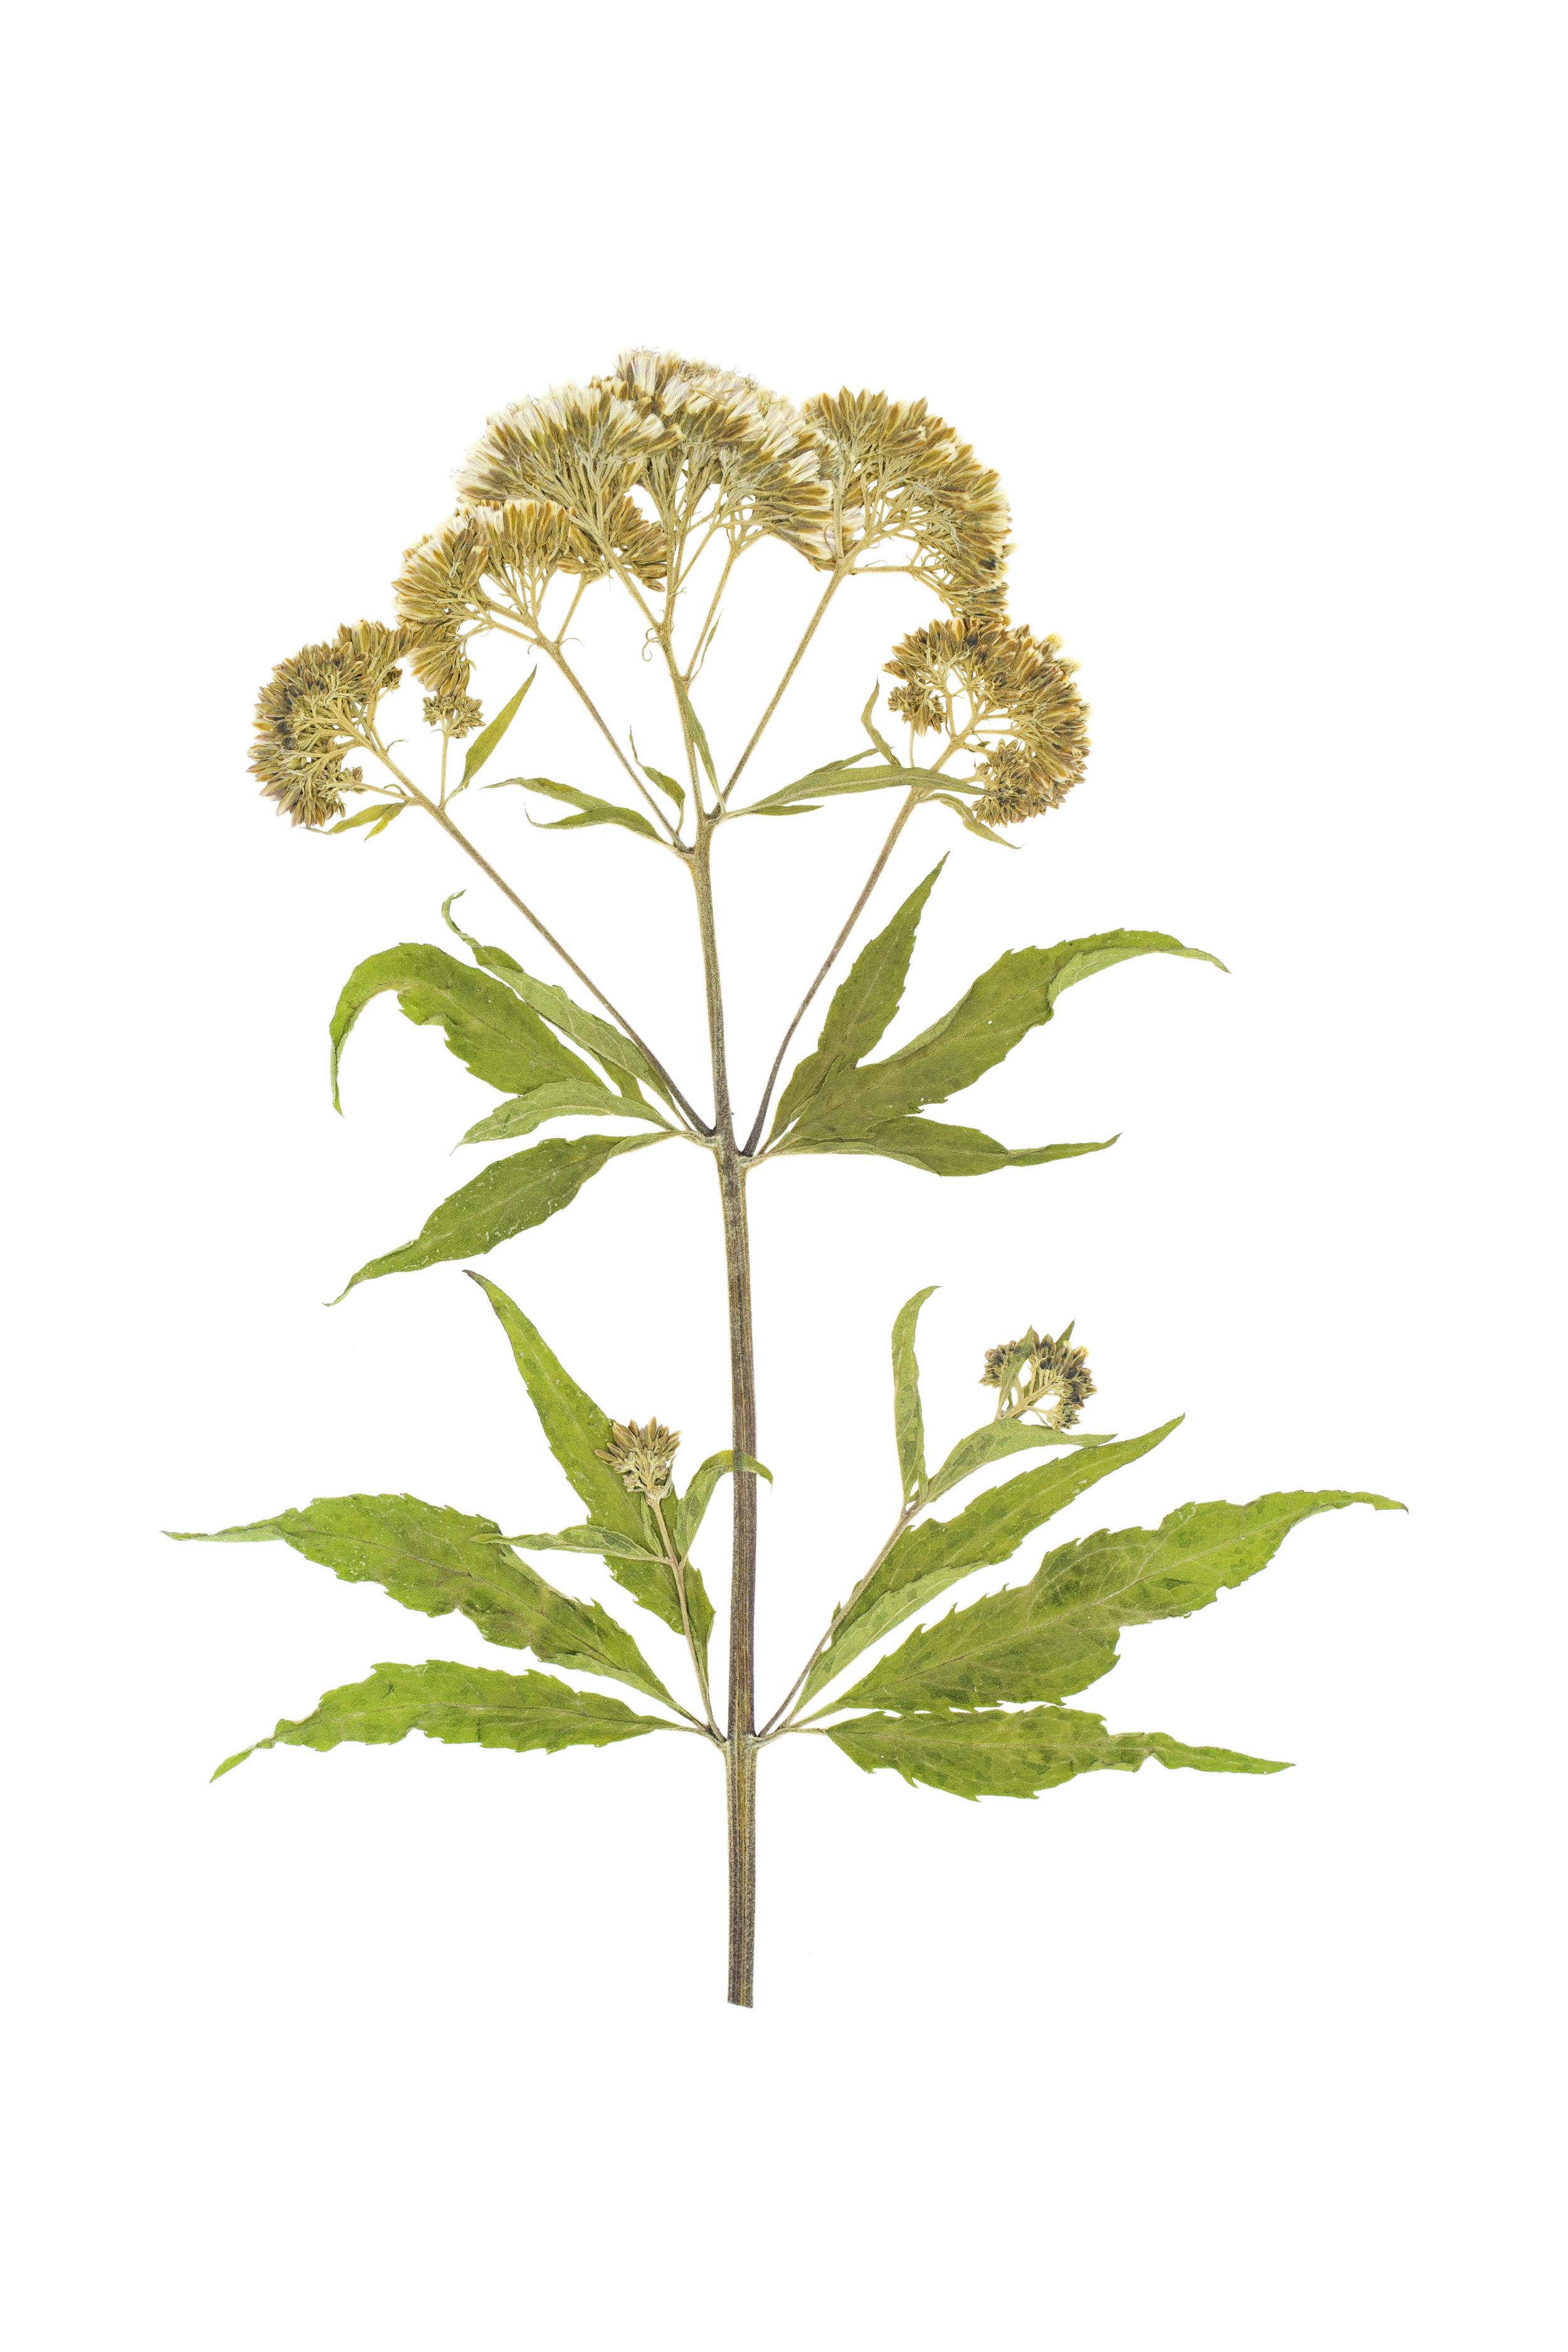 Hemp Agrimony / Eupatorium cannabinum